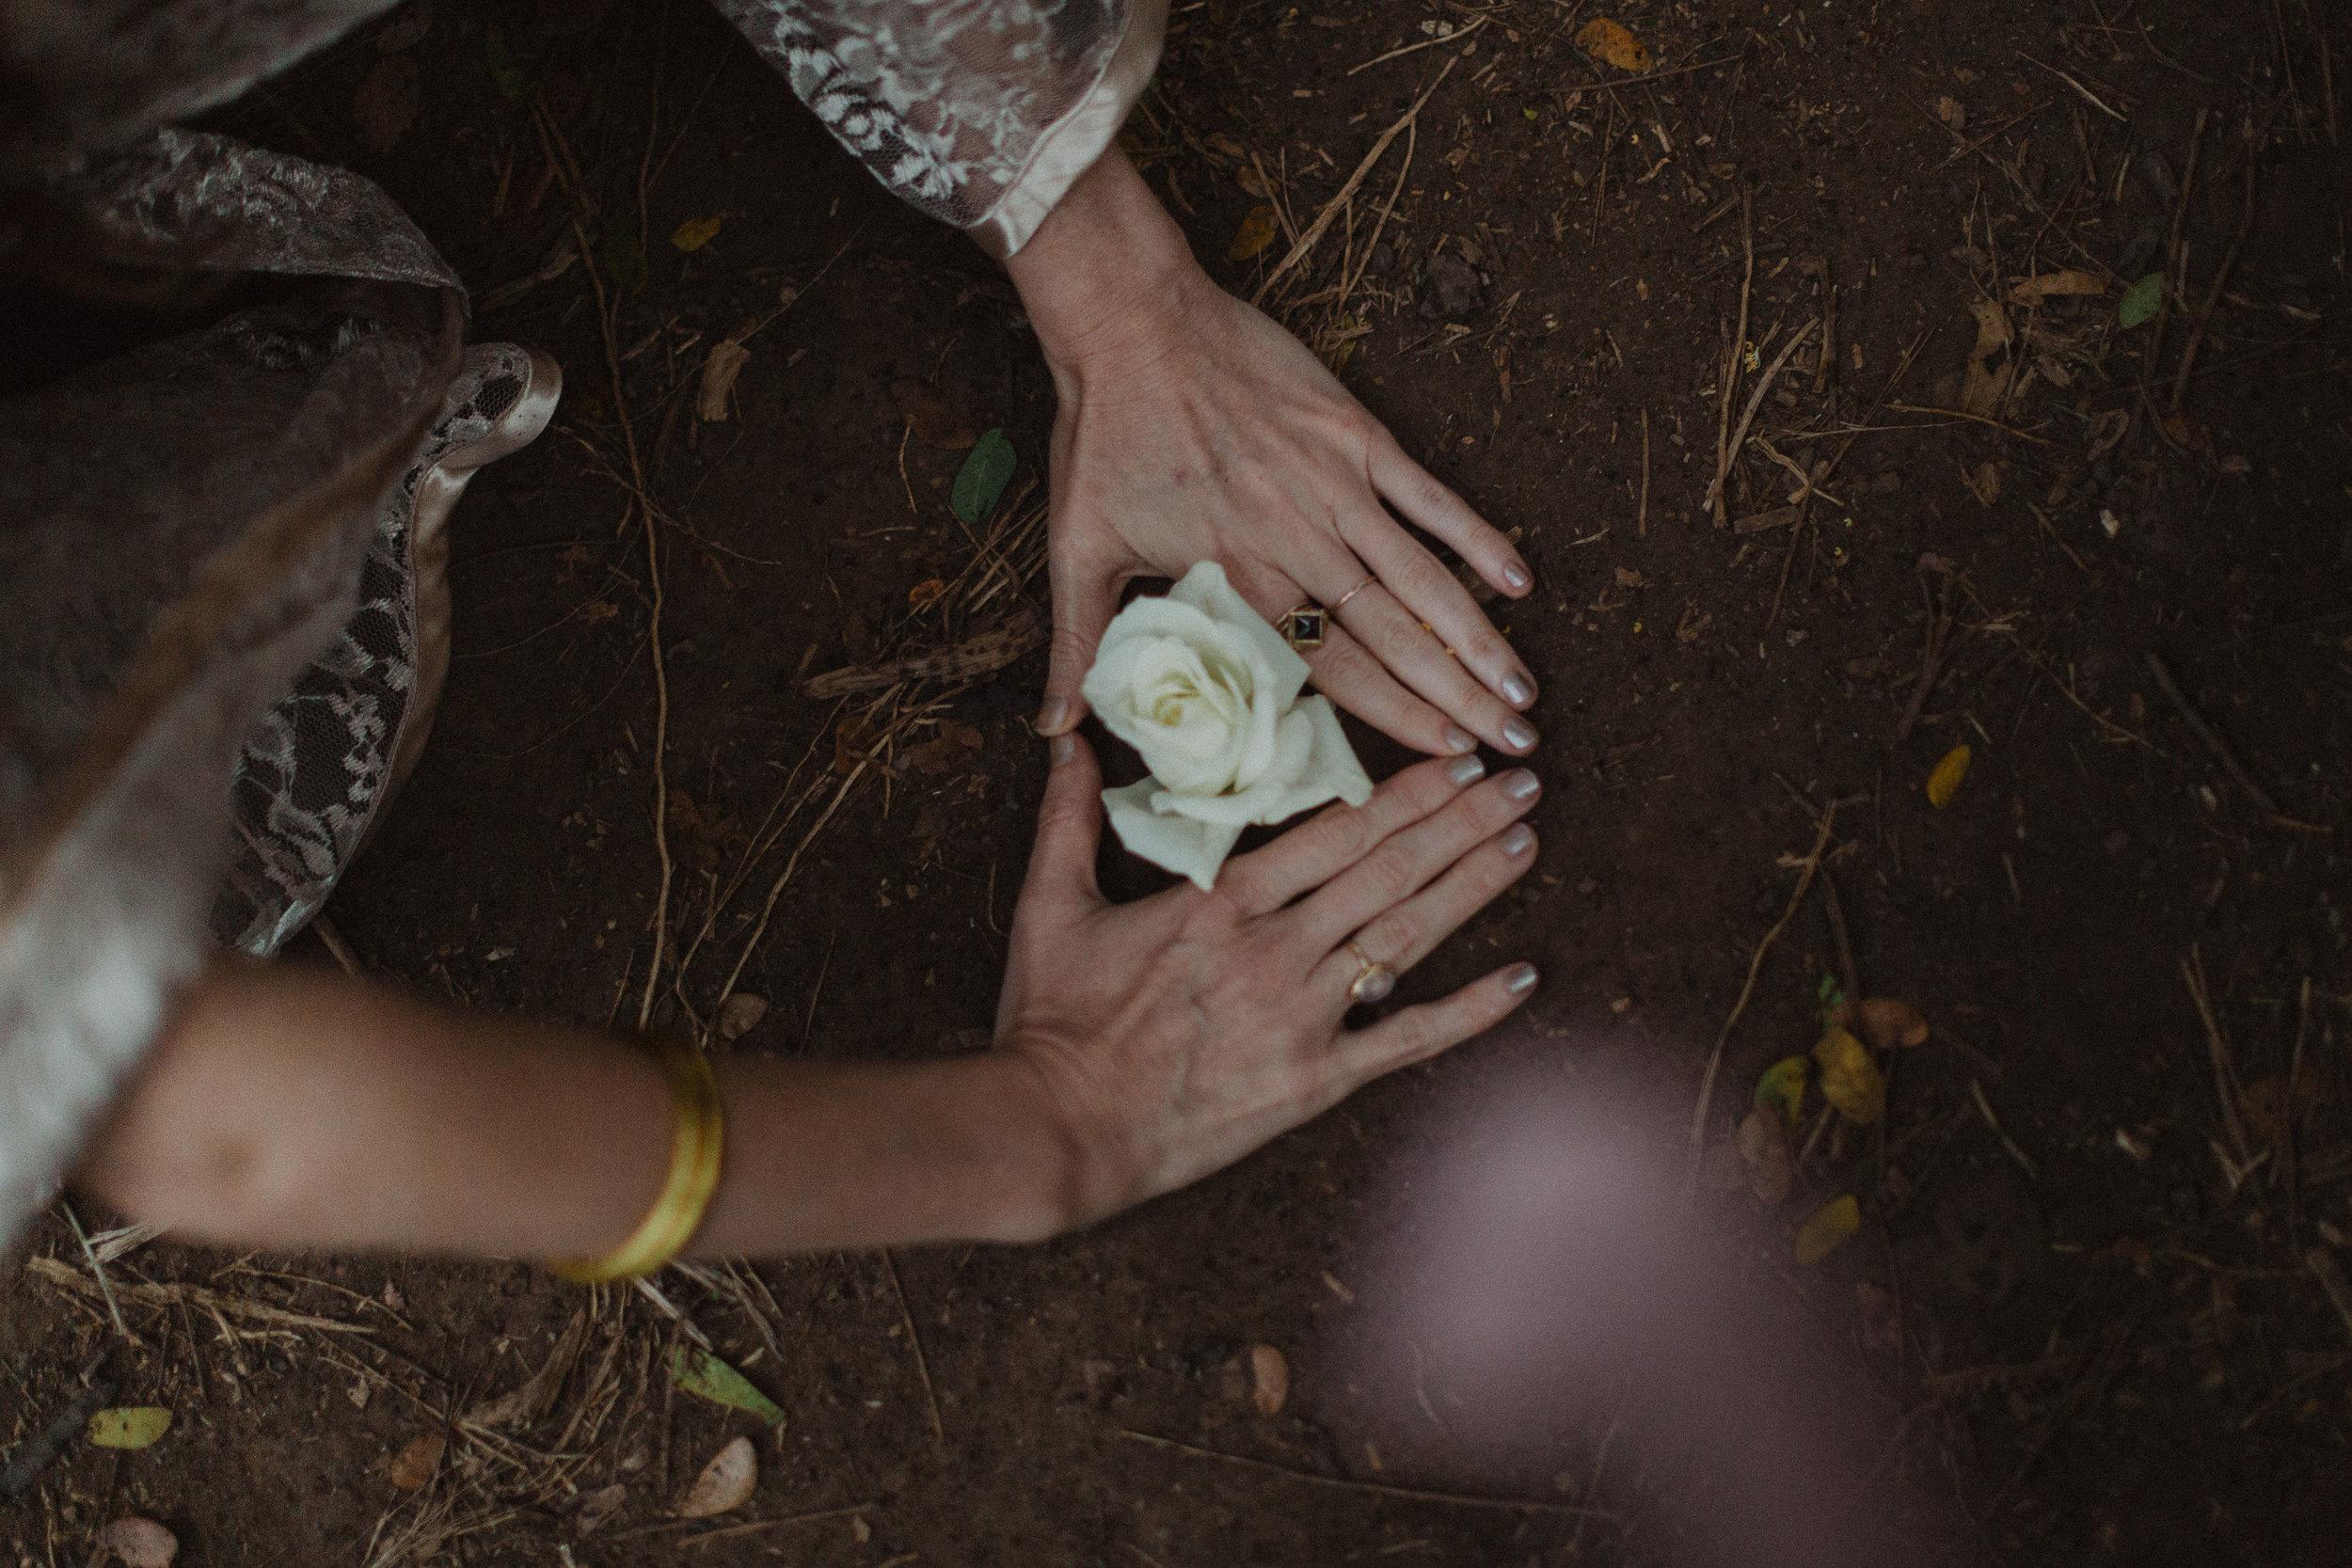 achintya-ameya-roses-8773.jpg